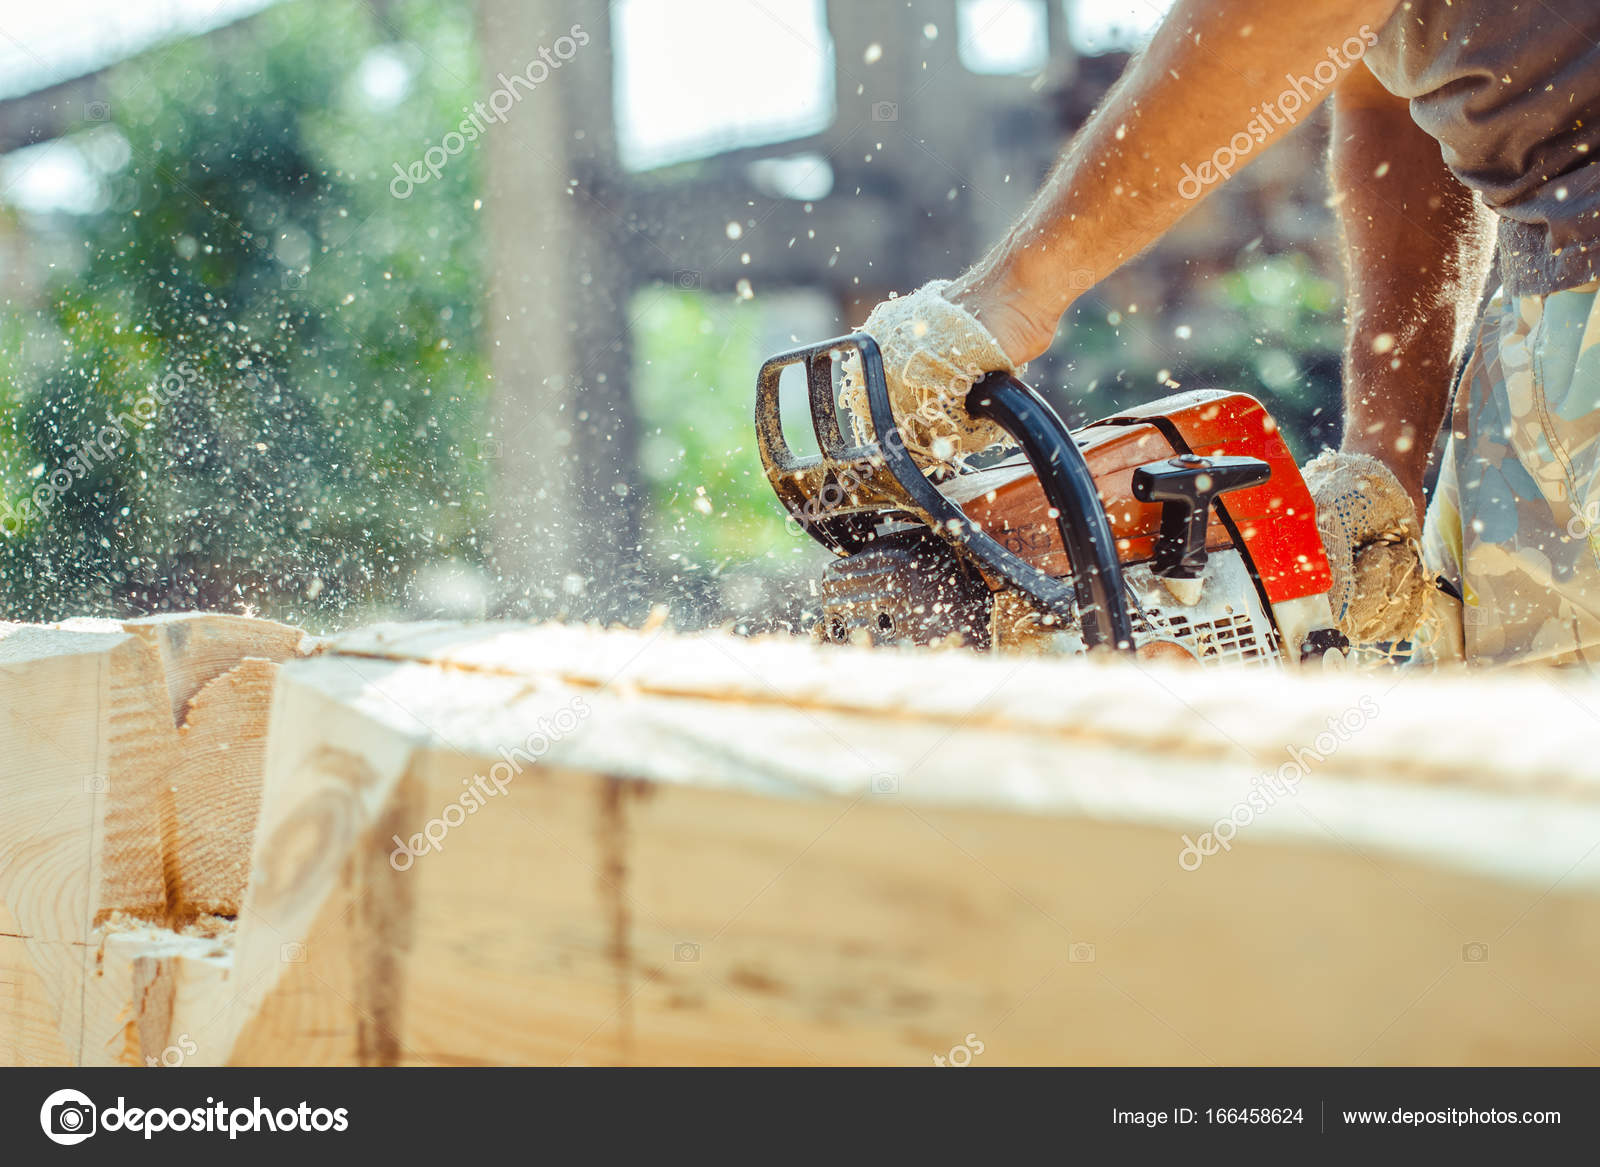 arbeiter einen kettensäge baum sägen — stockfoto © venerala #166458624